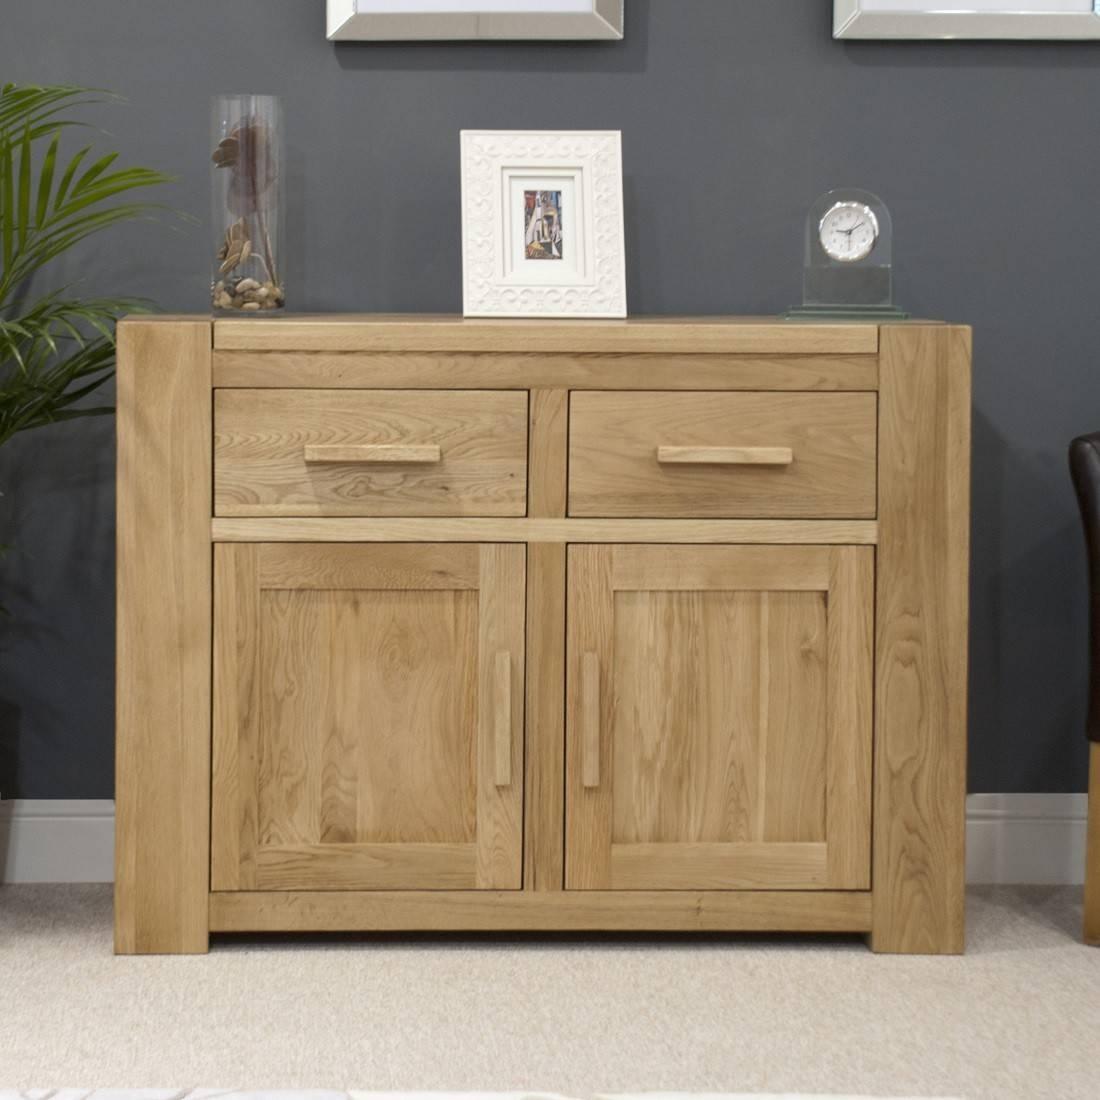 Trend Solid Oak Small 2 Door Sideboard | Oak Furniture Uk With Regard To Furniture Sideboards (View 3 of 15)